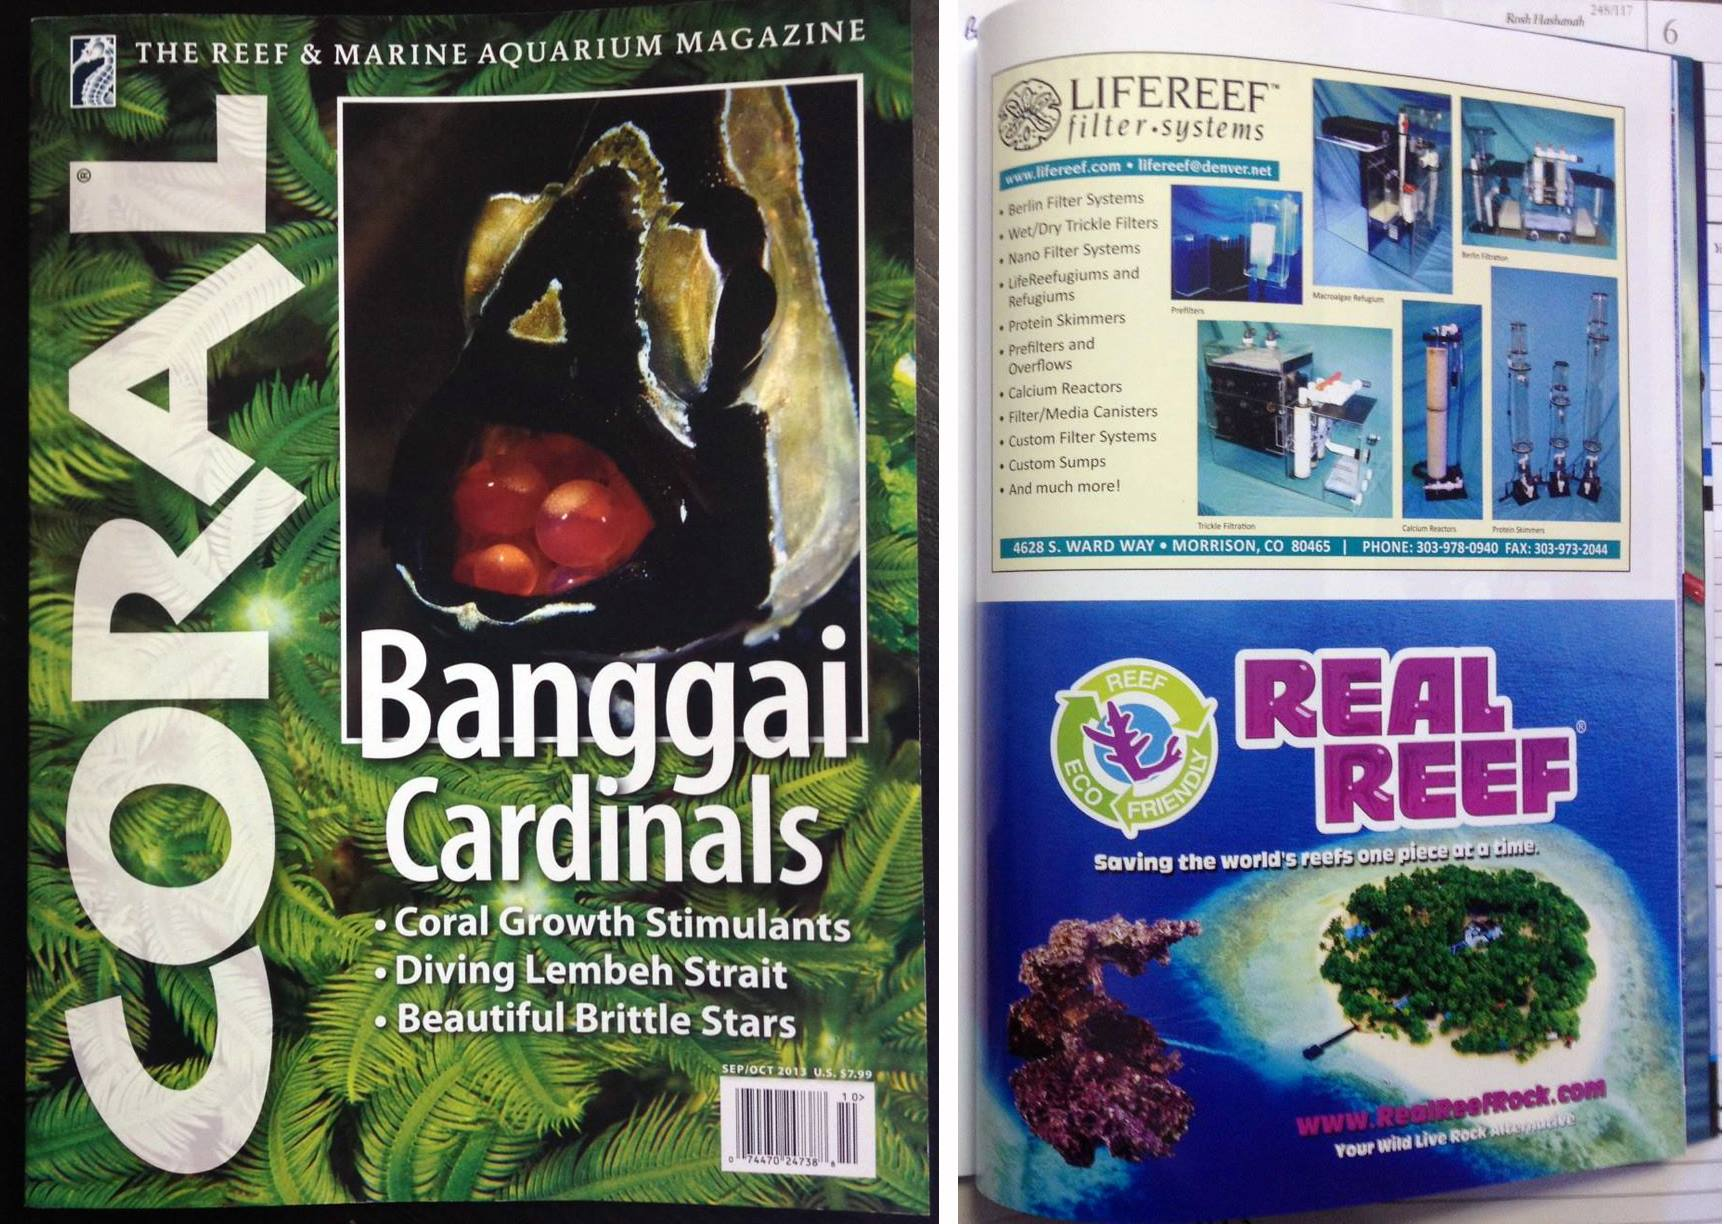 Real Reef half page print ad